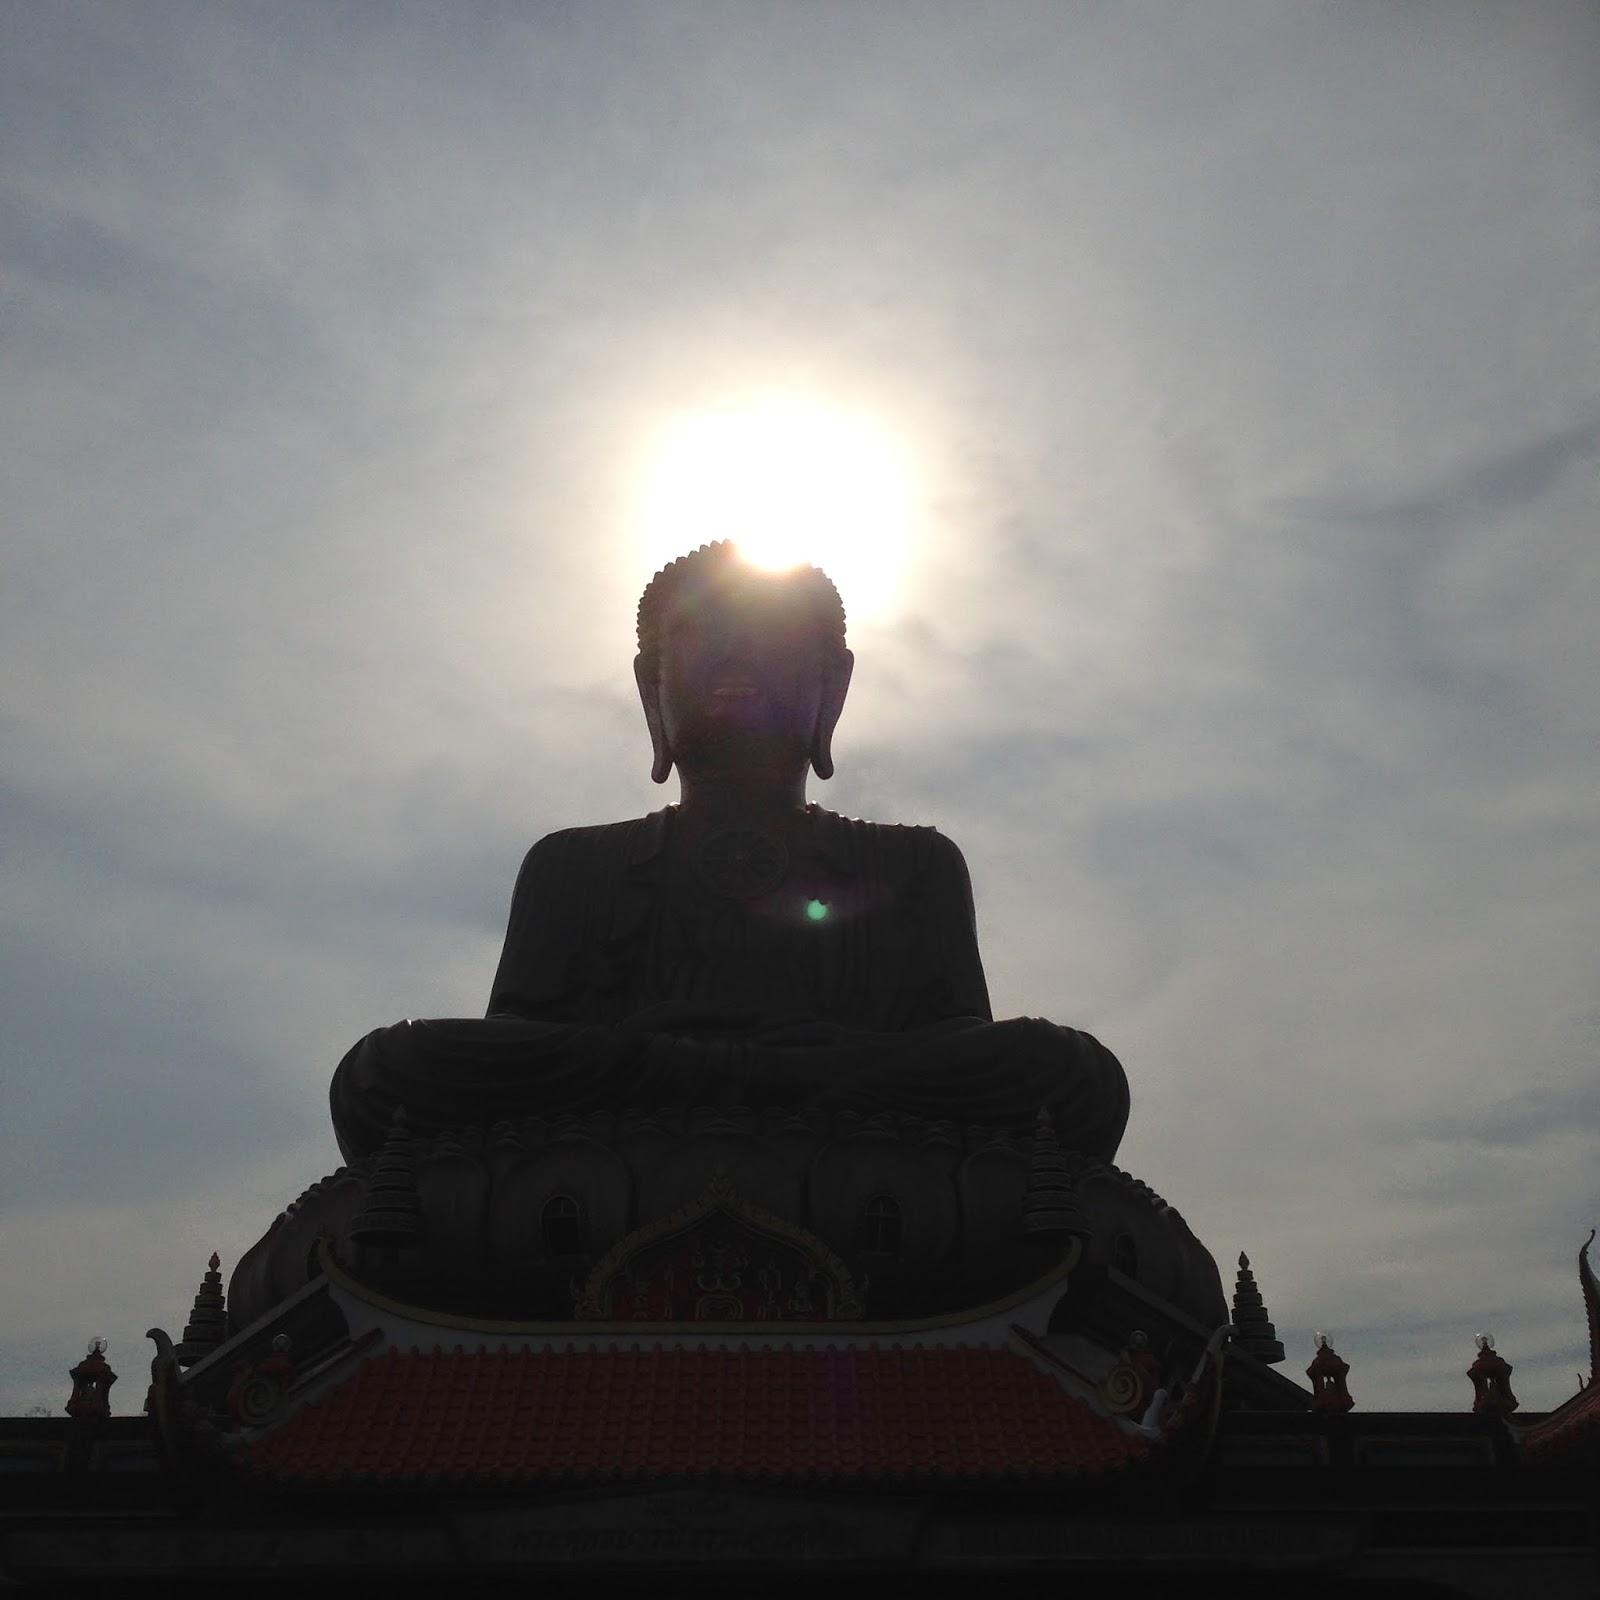 Wat Machimmaram - Sun behind Buddha